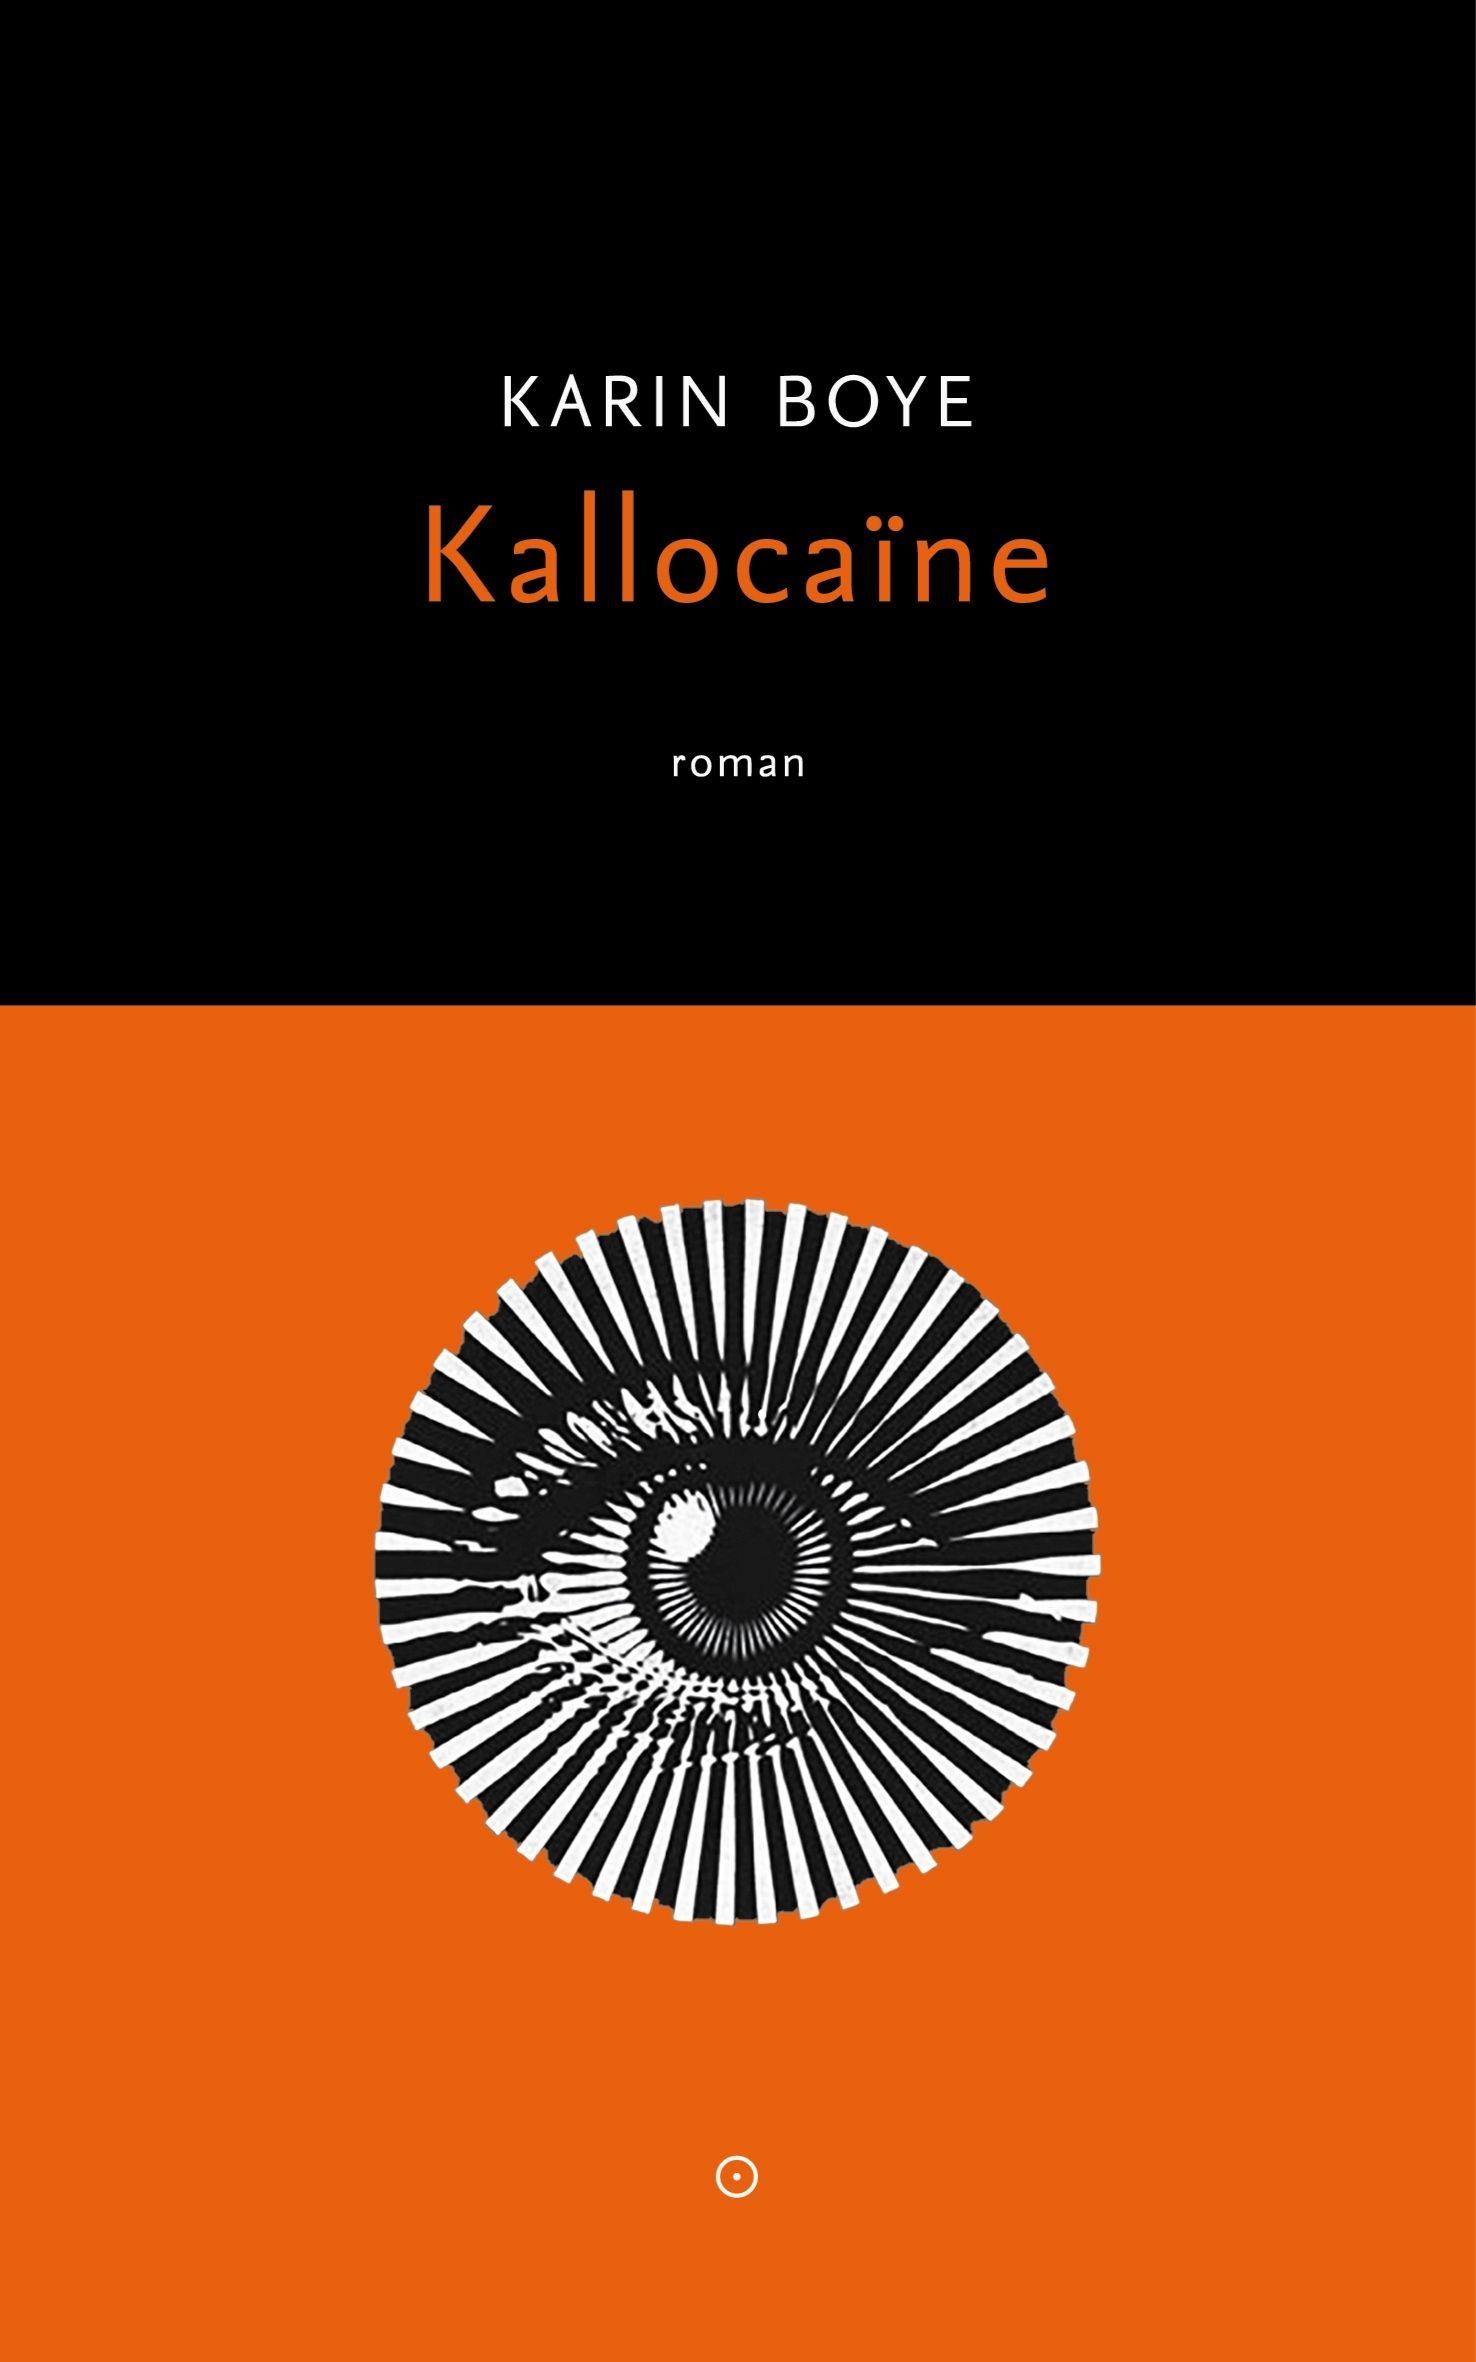 Kallocaine – Karin Boye